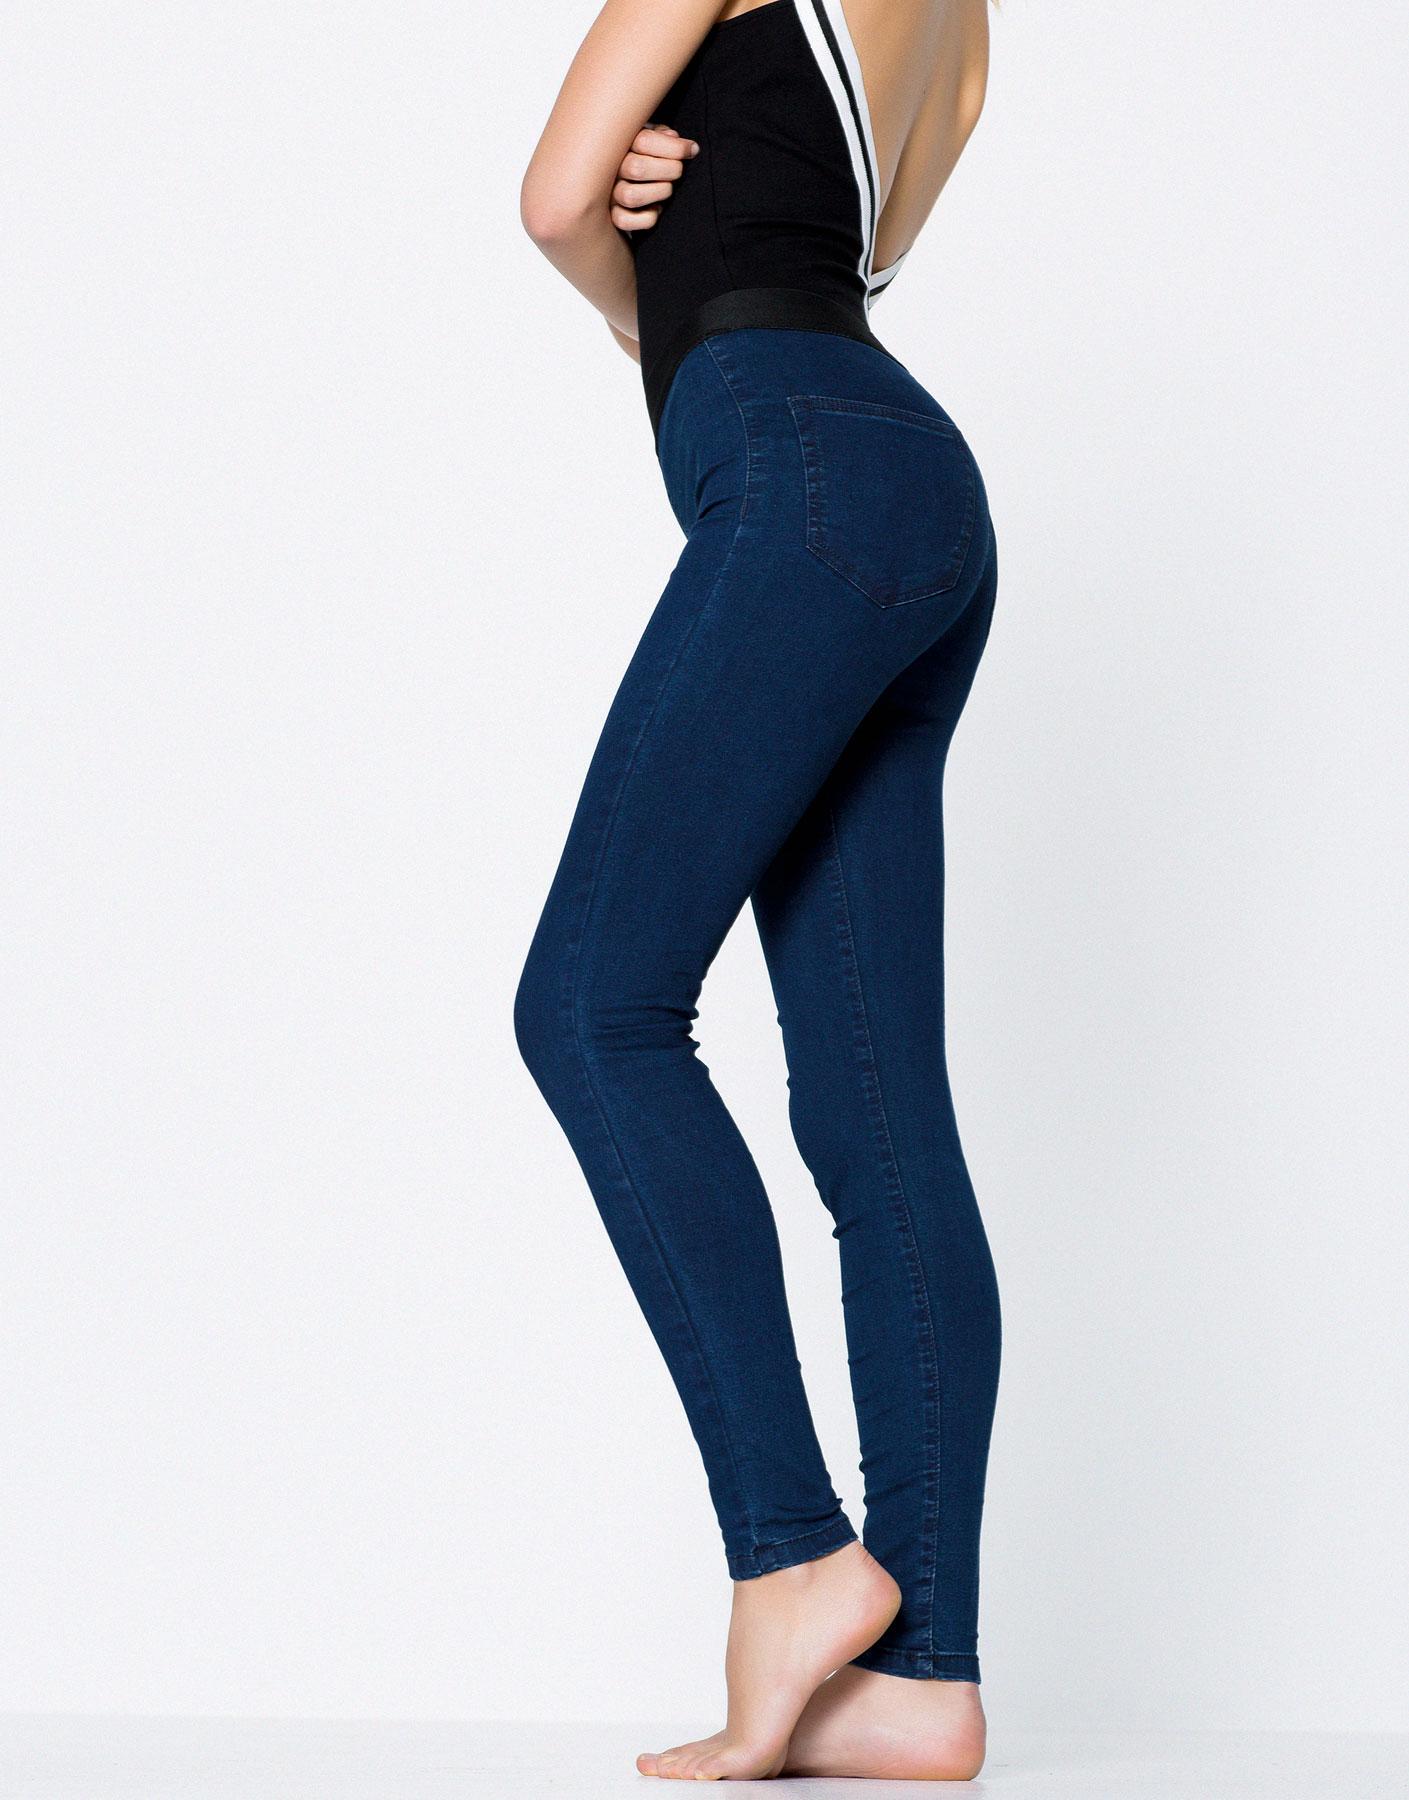 Yoga-jeans